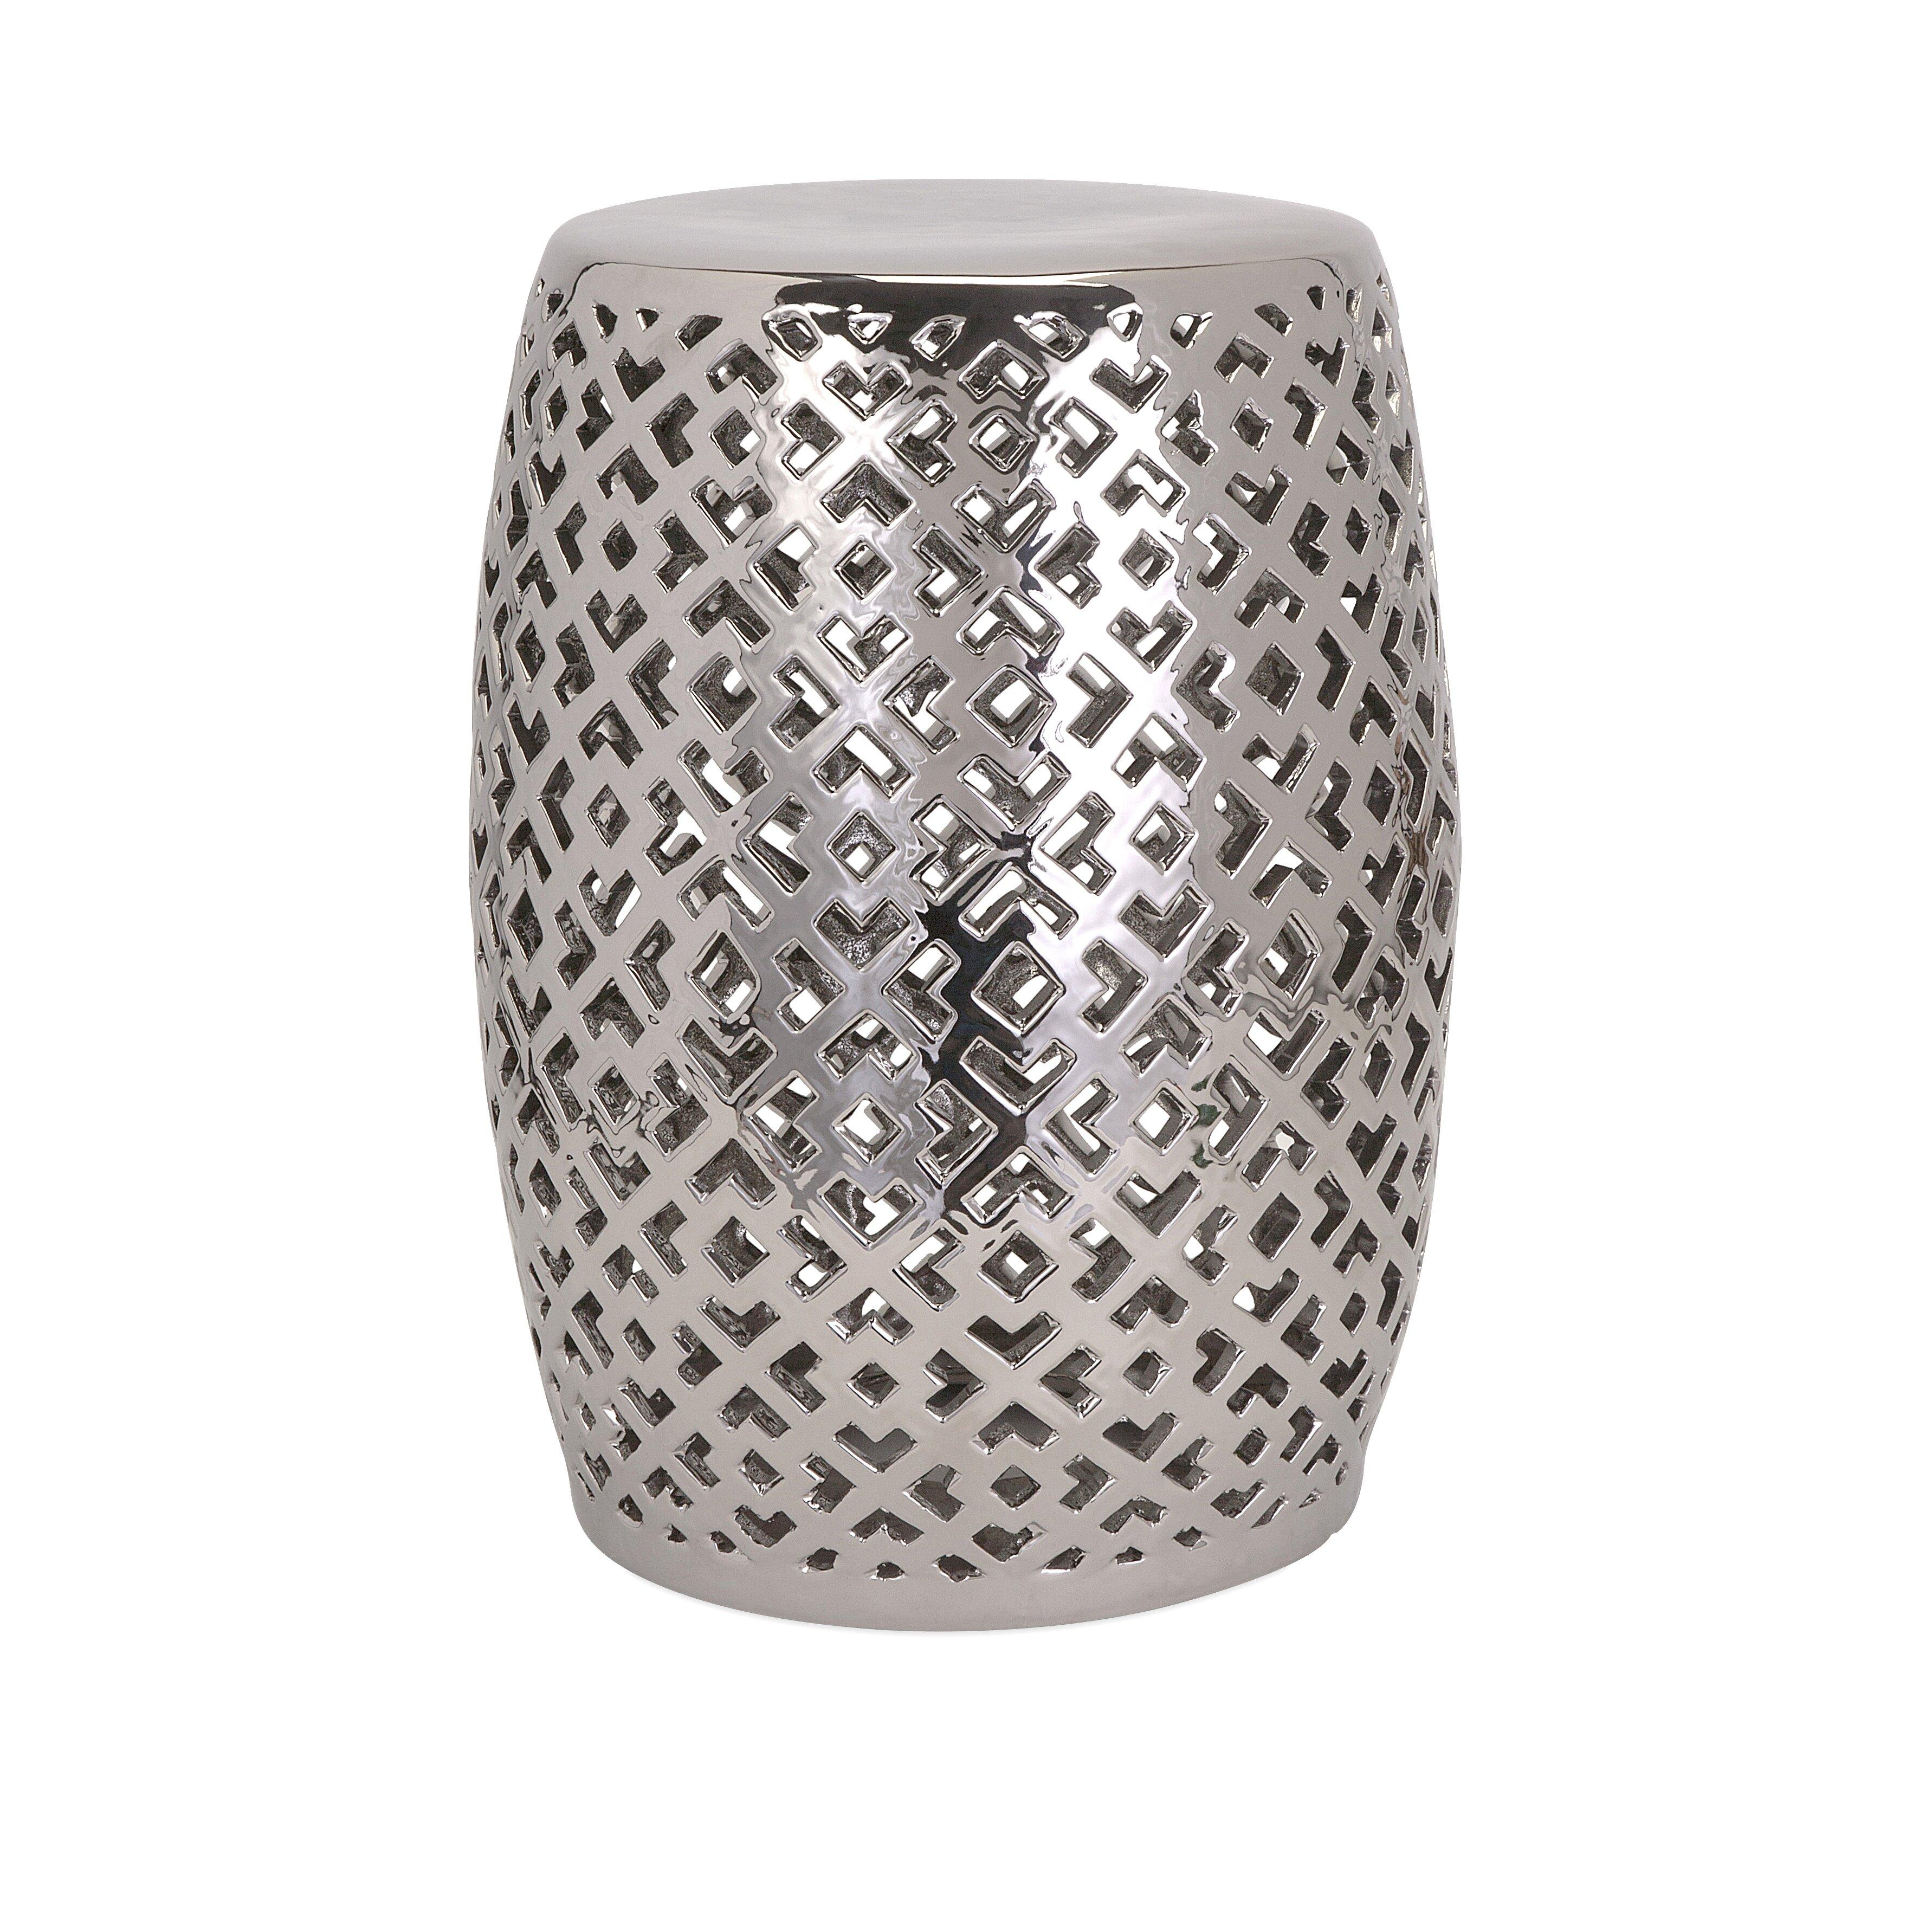 Imax Lexor Ceramic Garden Stool Amp Reviews Wayfair